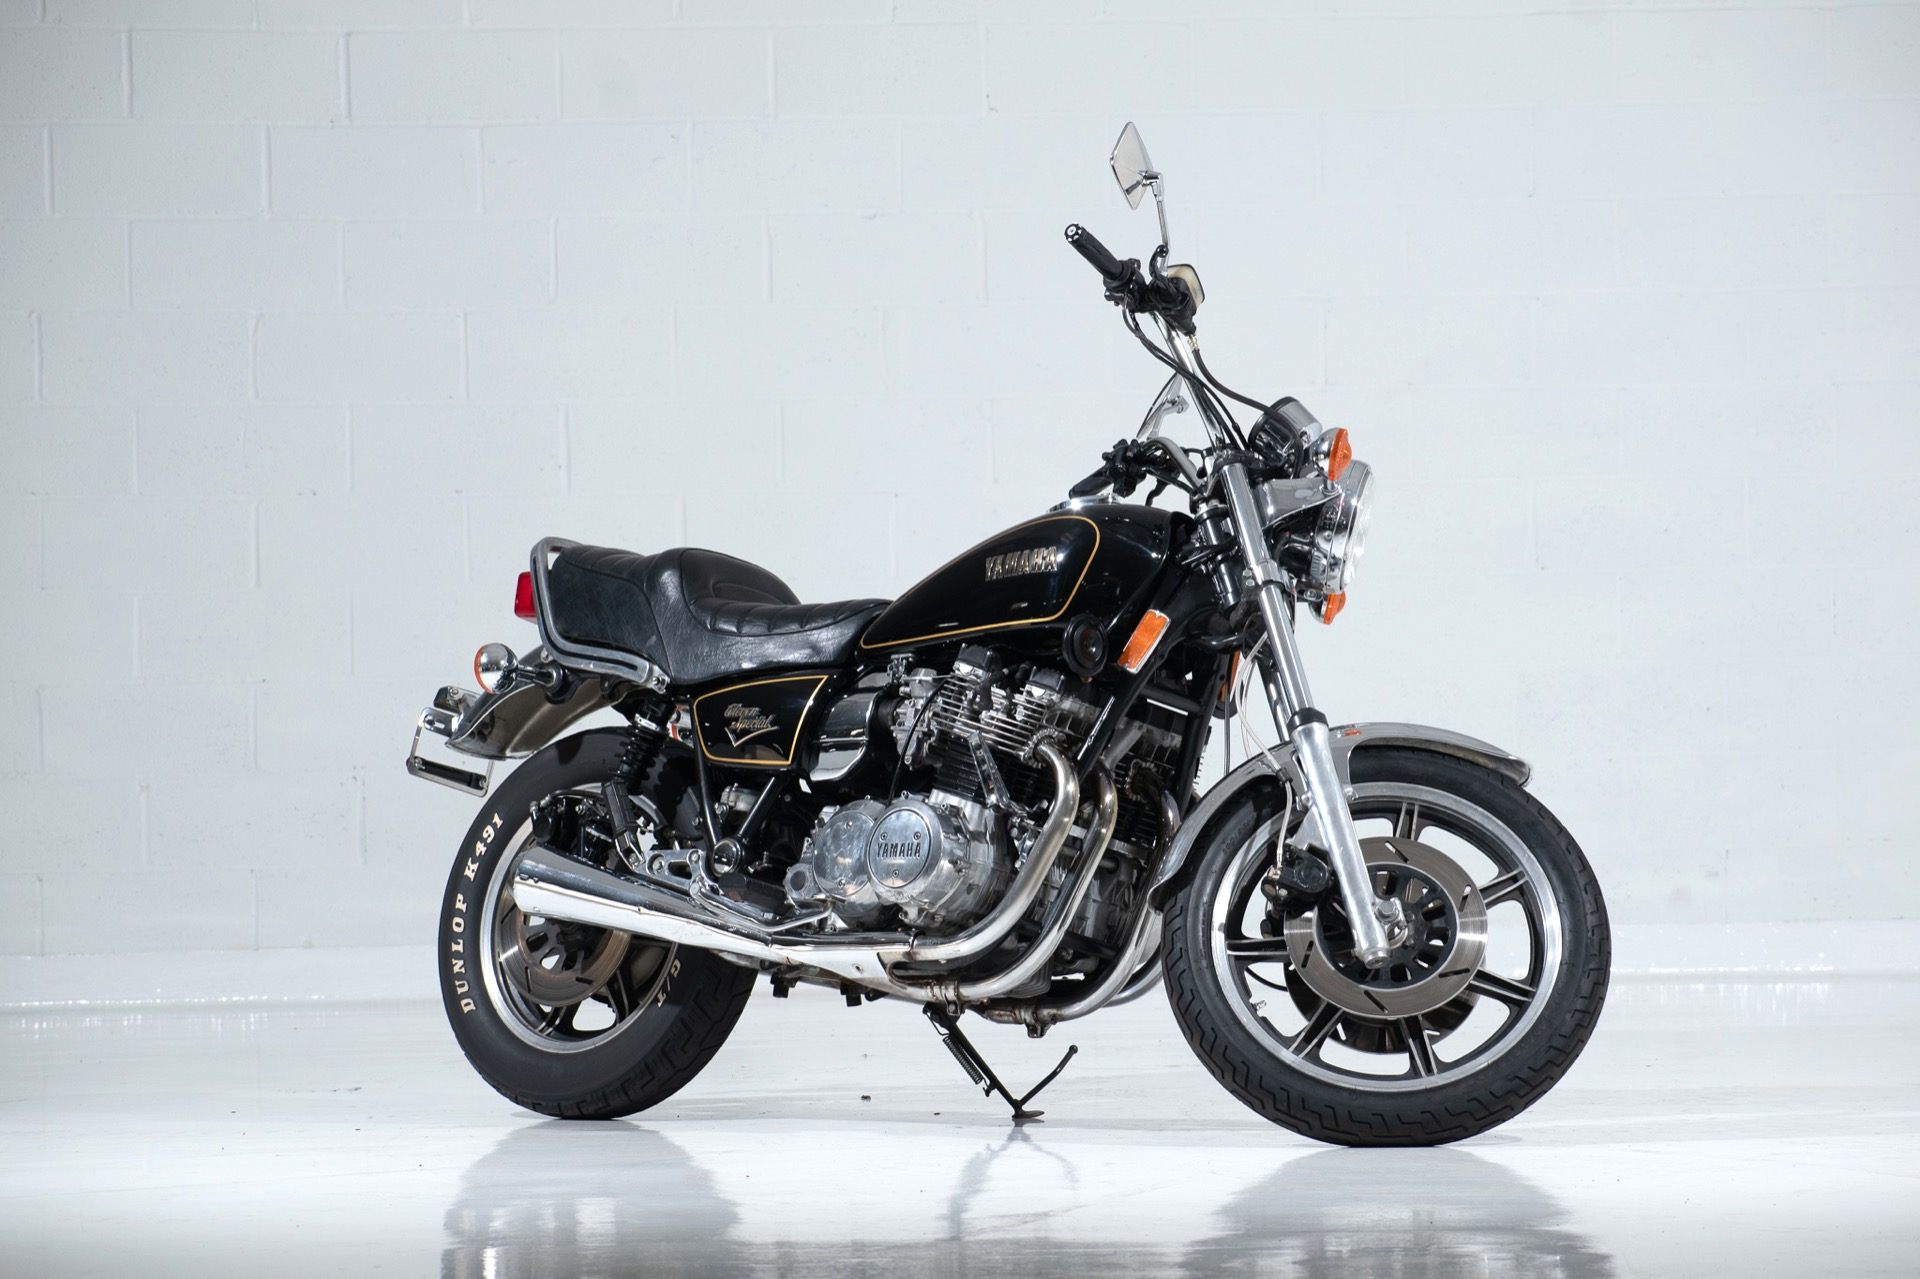 Used 1981 Yamaha XS1100  | Farmingdale, NY